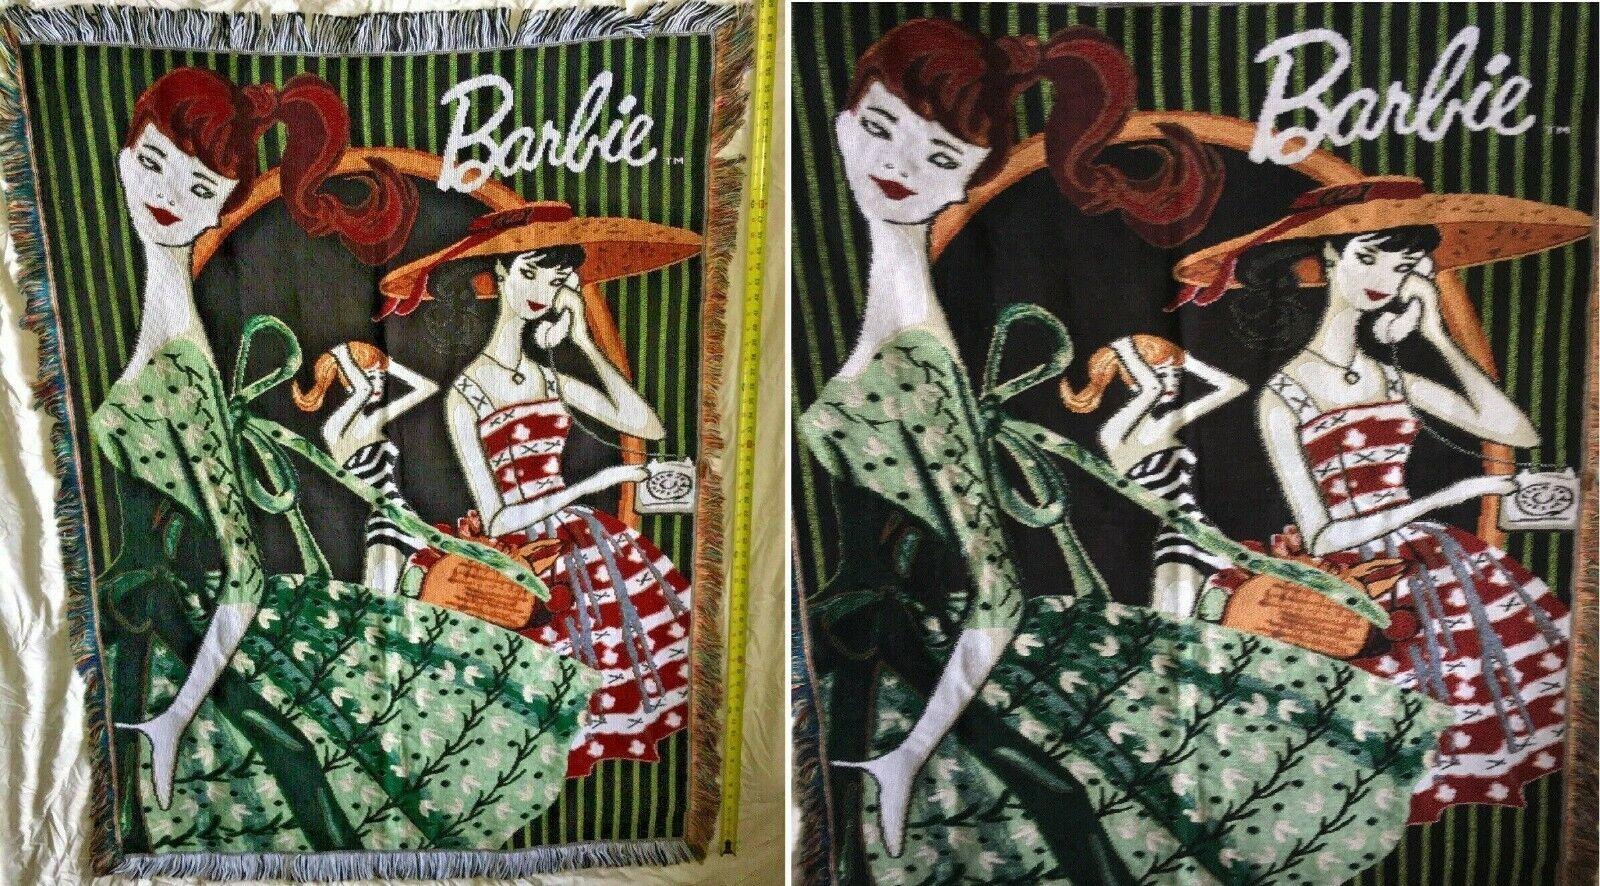 2003 Barbie PXR The Northern Company Decorative Throw Blanket 46 x 60